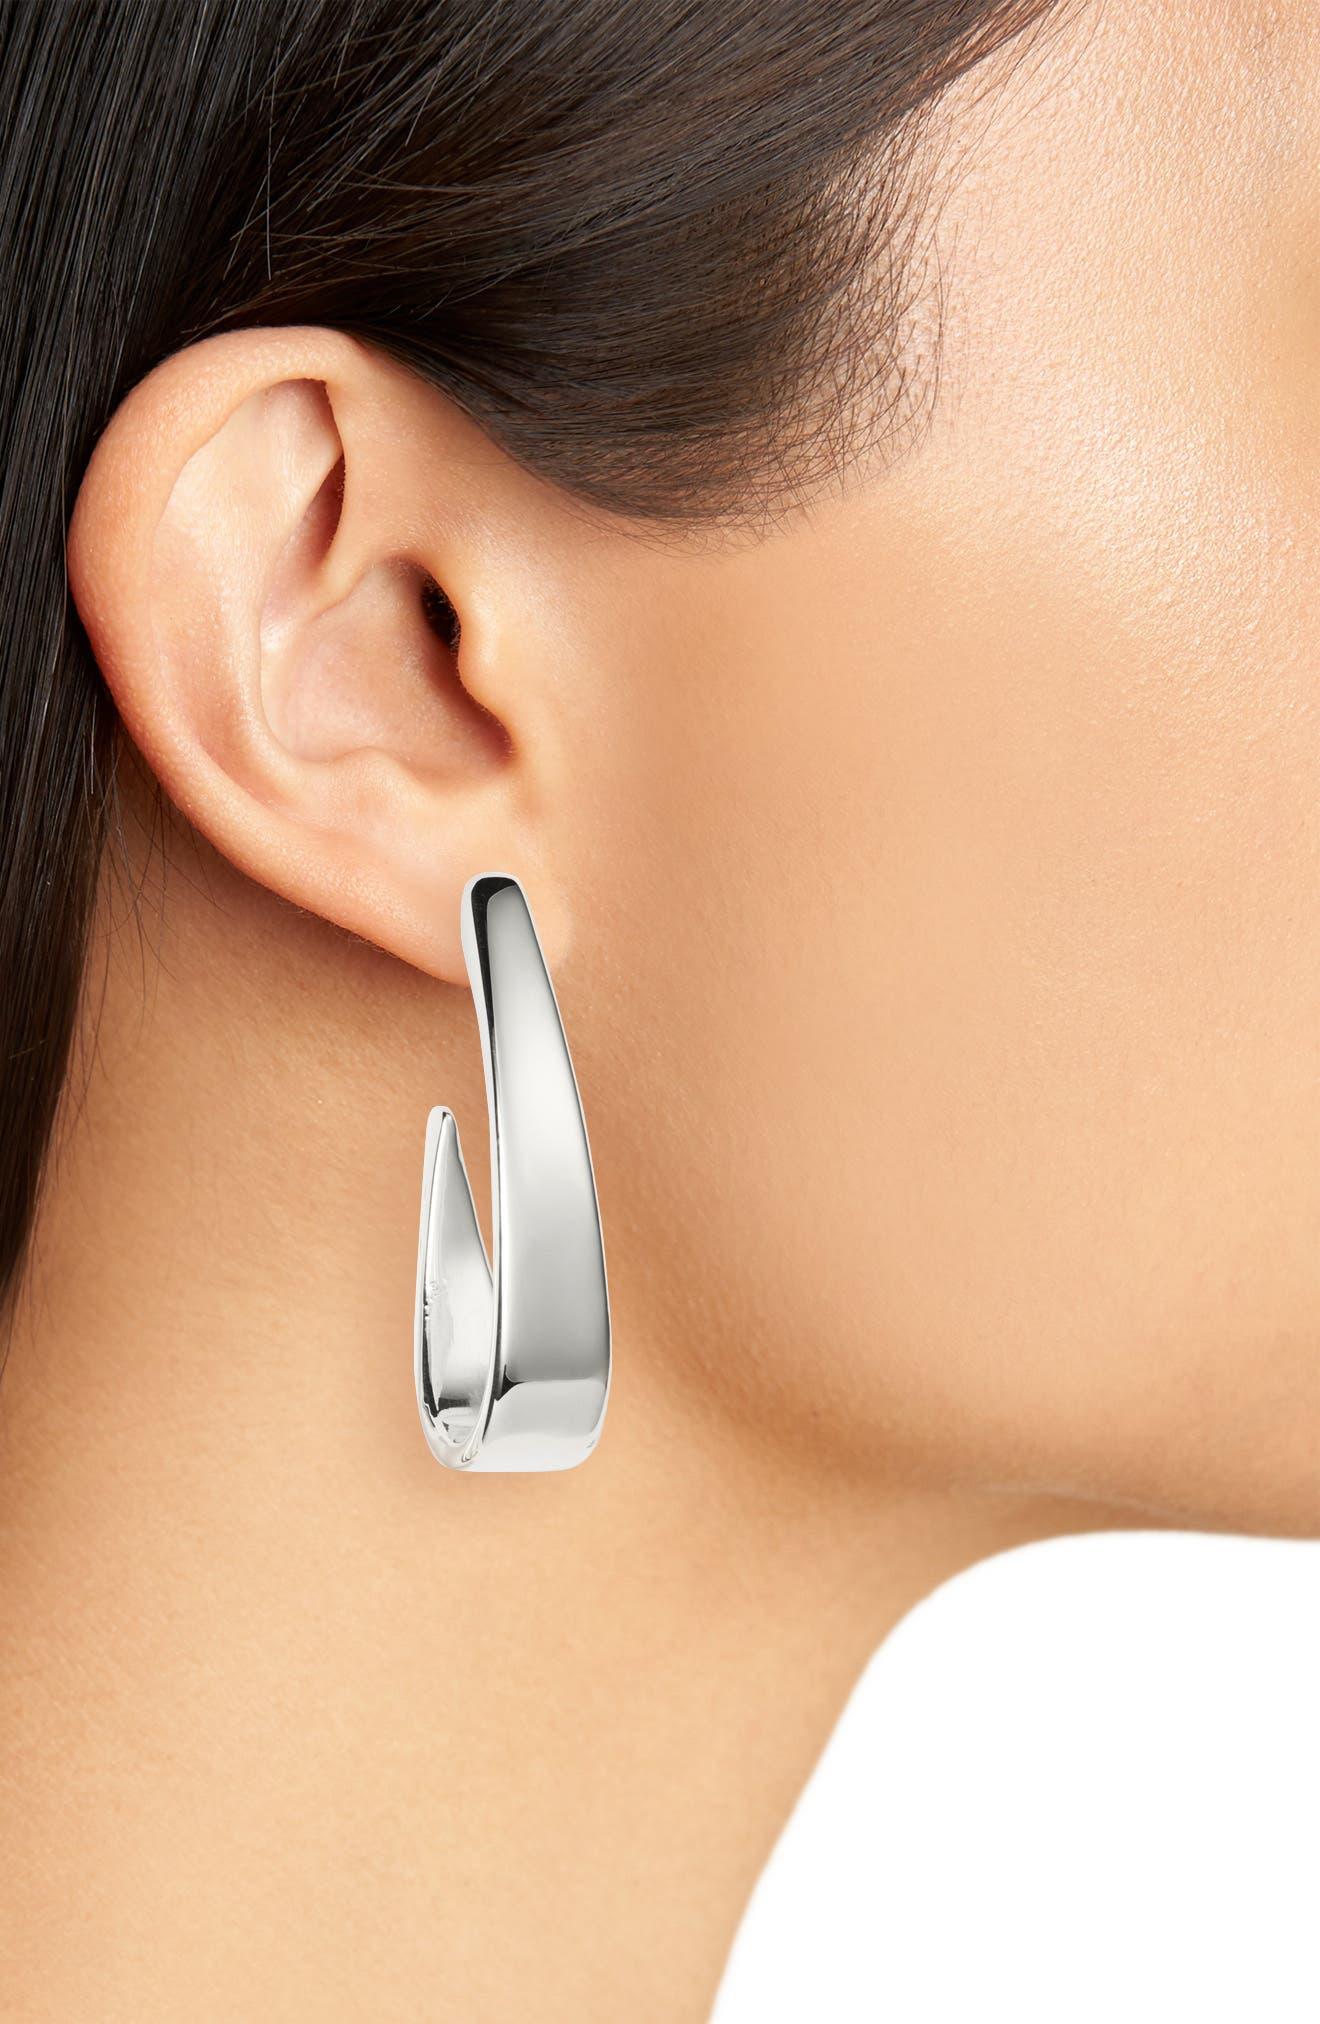 Elongated Oval Hoop Earrings,                             Alternate thumbnail 2, color,                             Silver